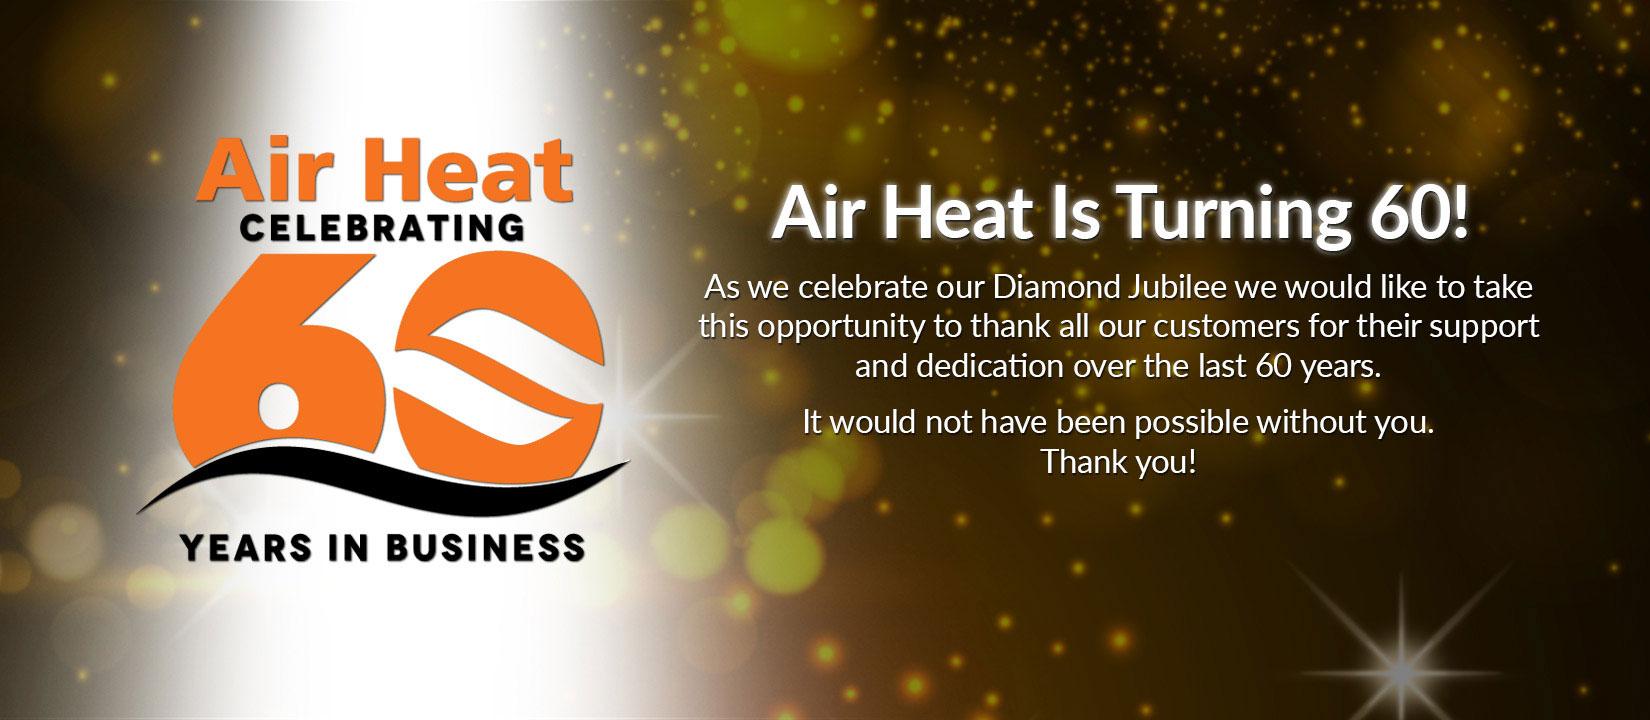 airheat-60anniversary-banner-01-02